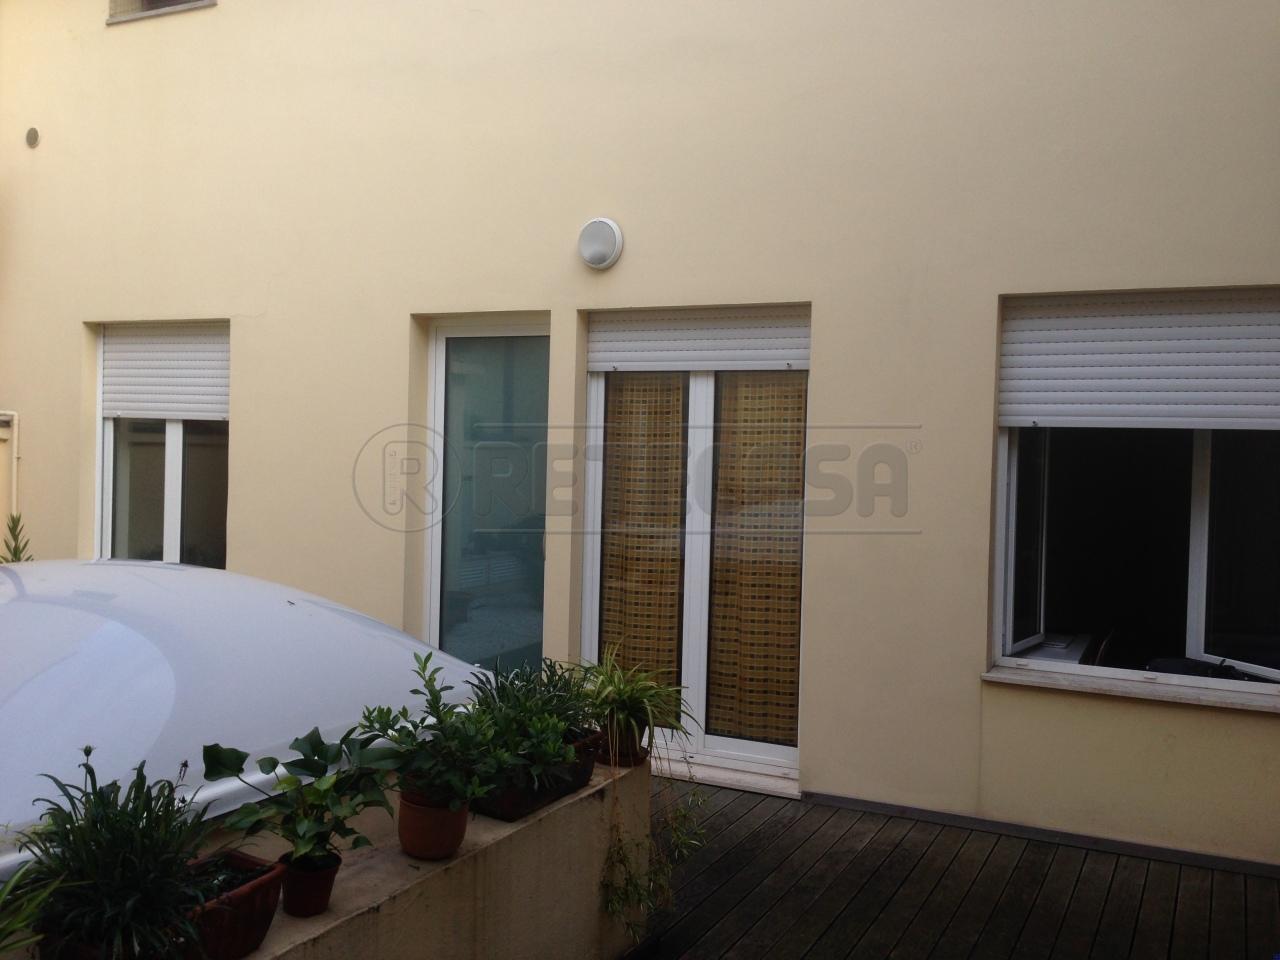 Bilocale Ancona Via San Martino 9